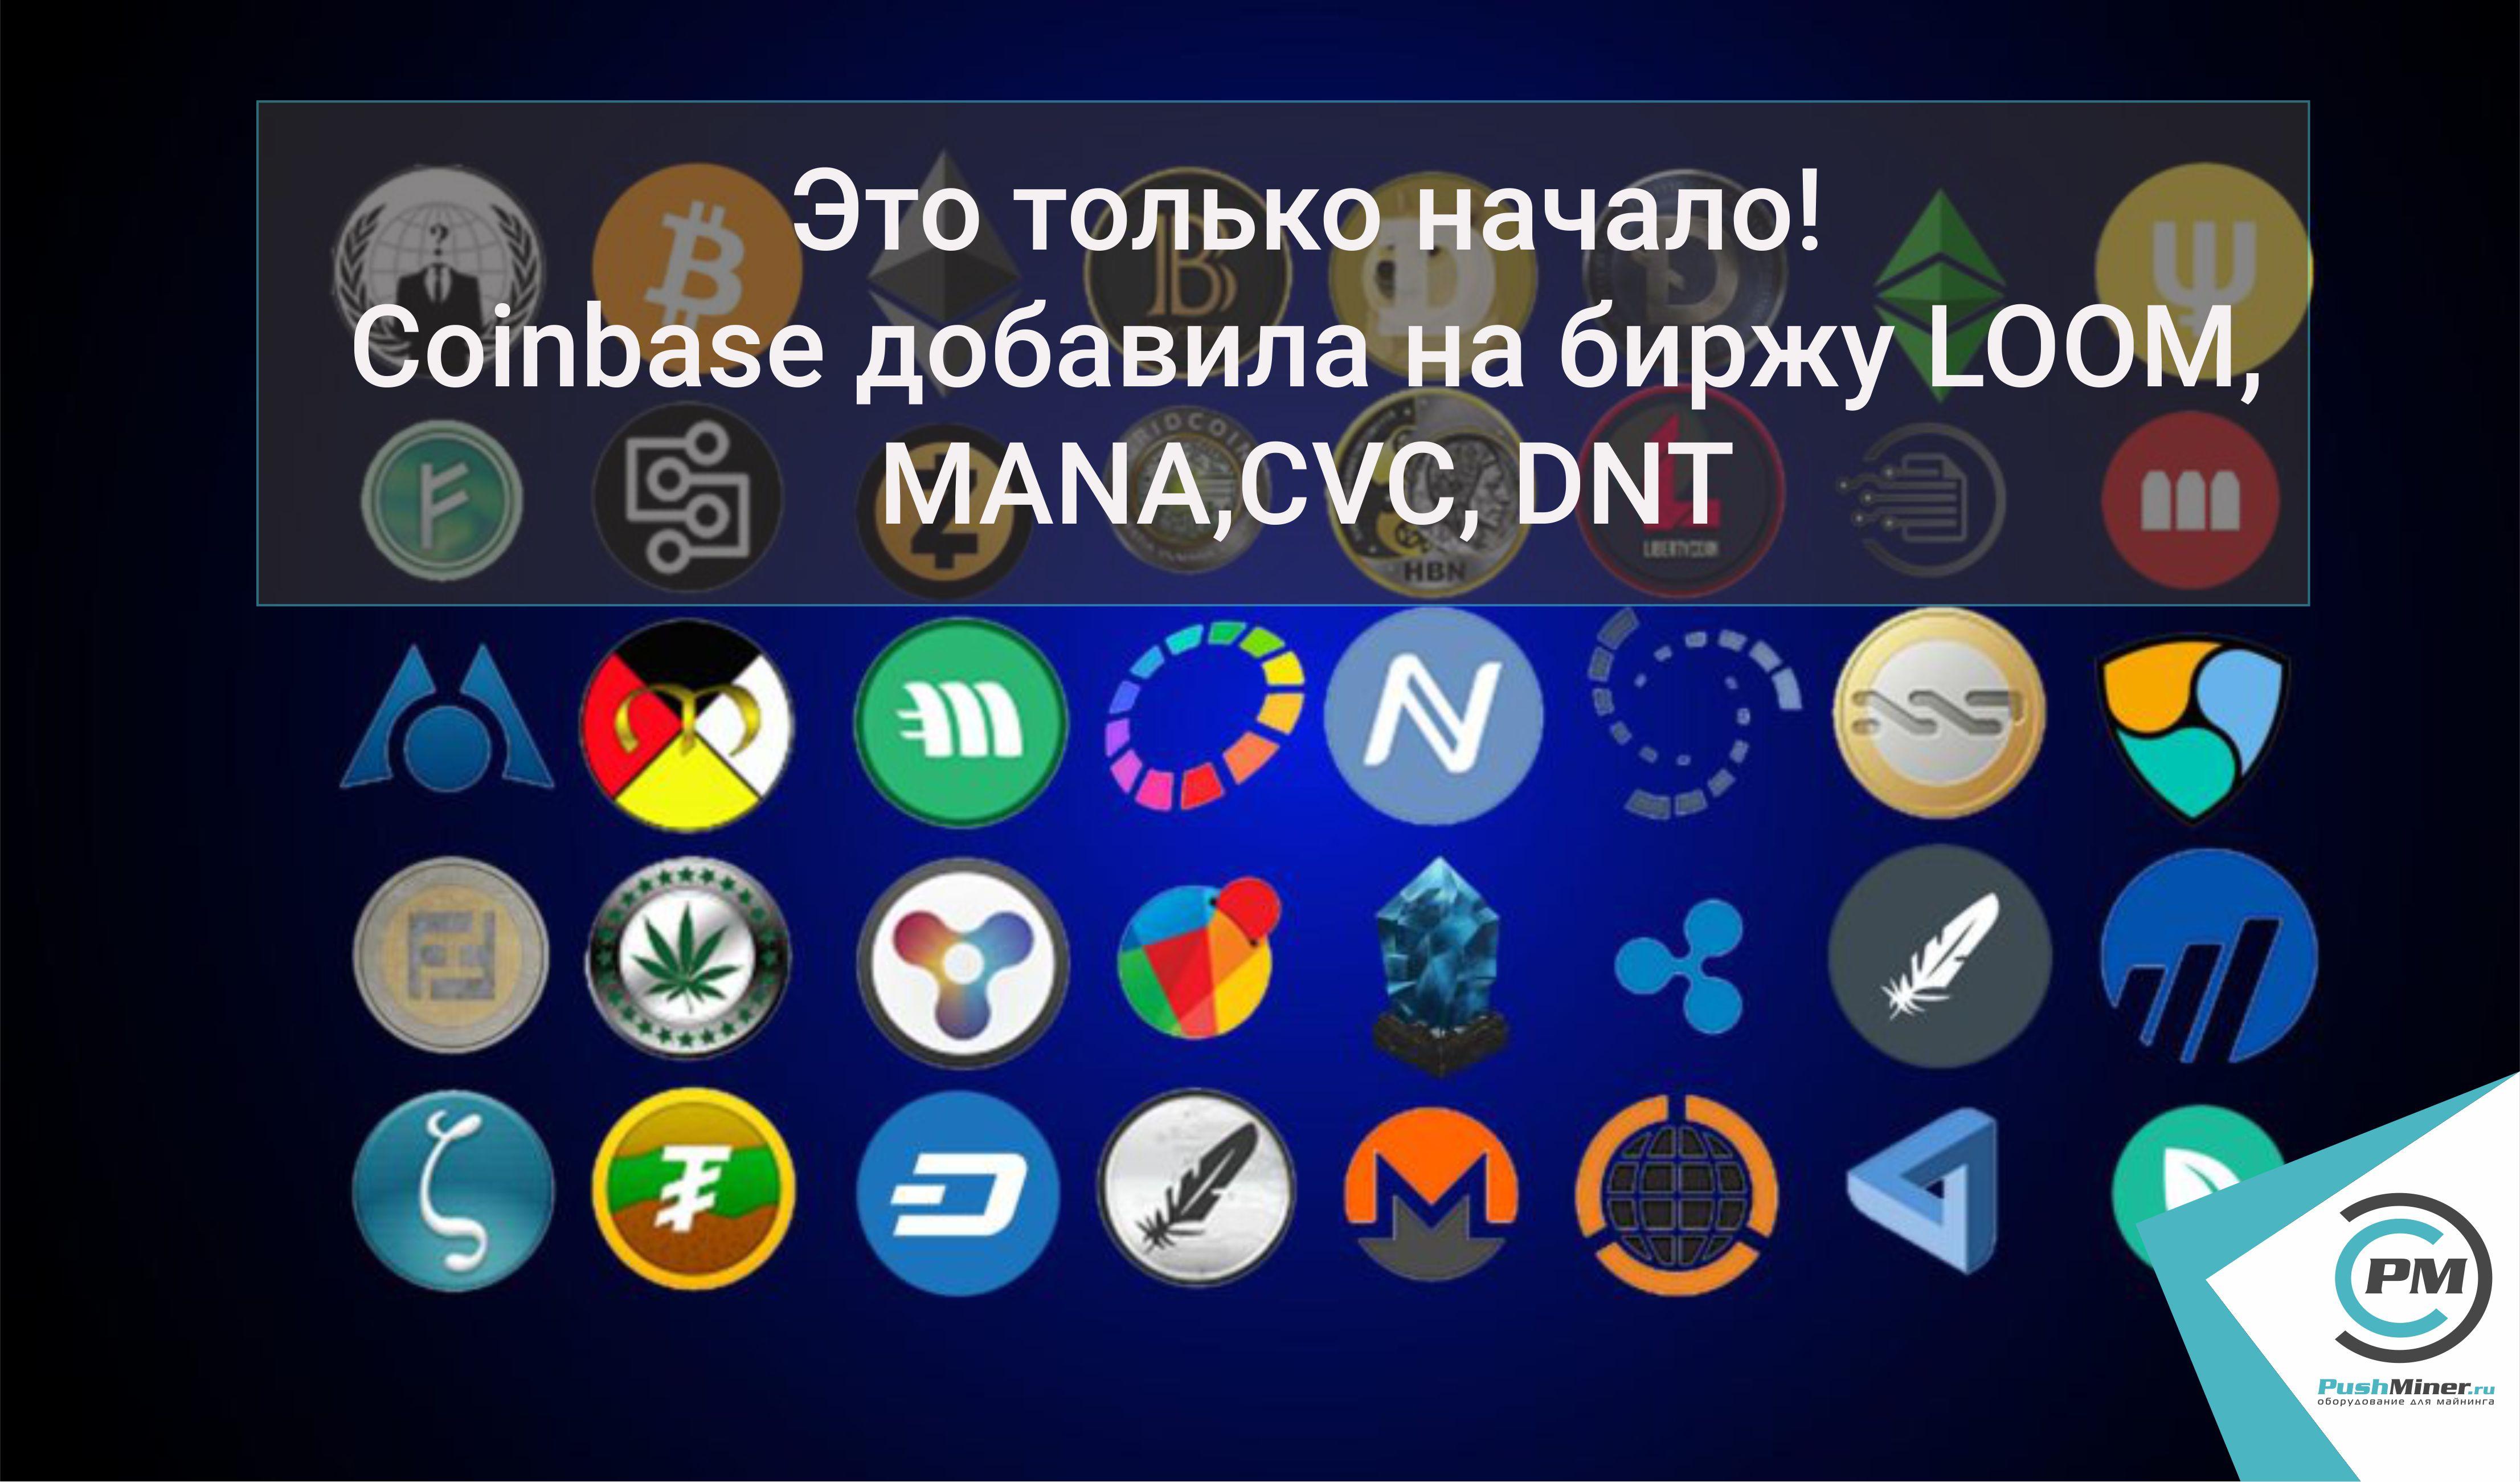 Это только начало! Coinbase добавила на биржу Loom Network, Civic, district0x, Decentraland